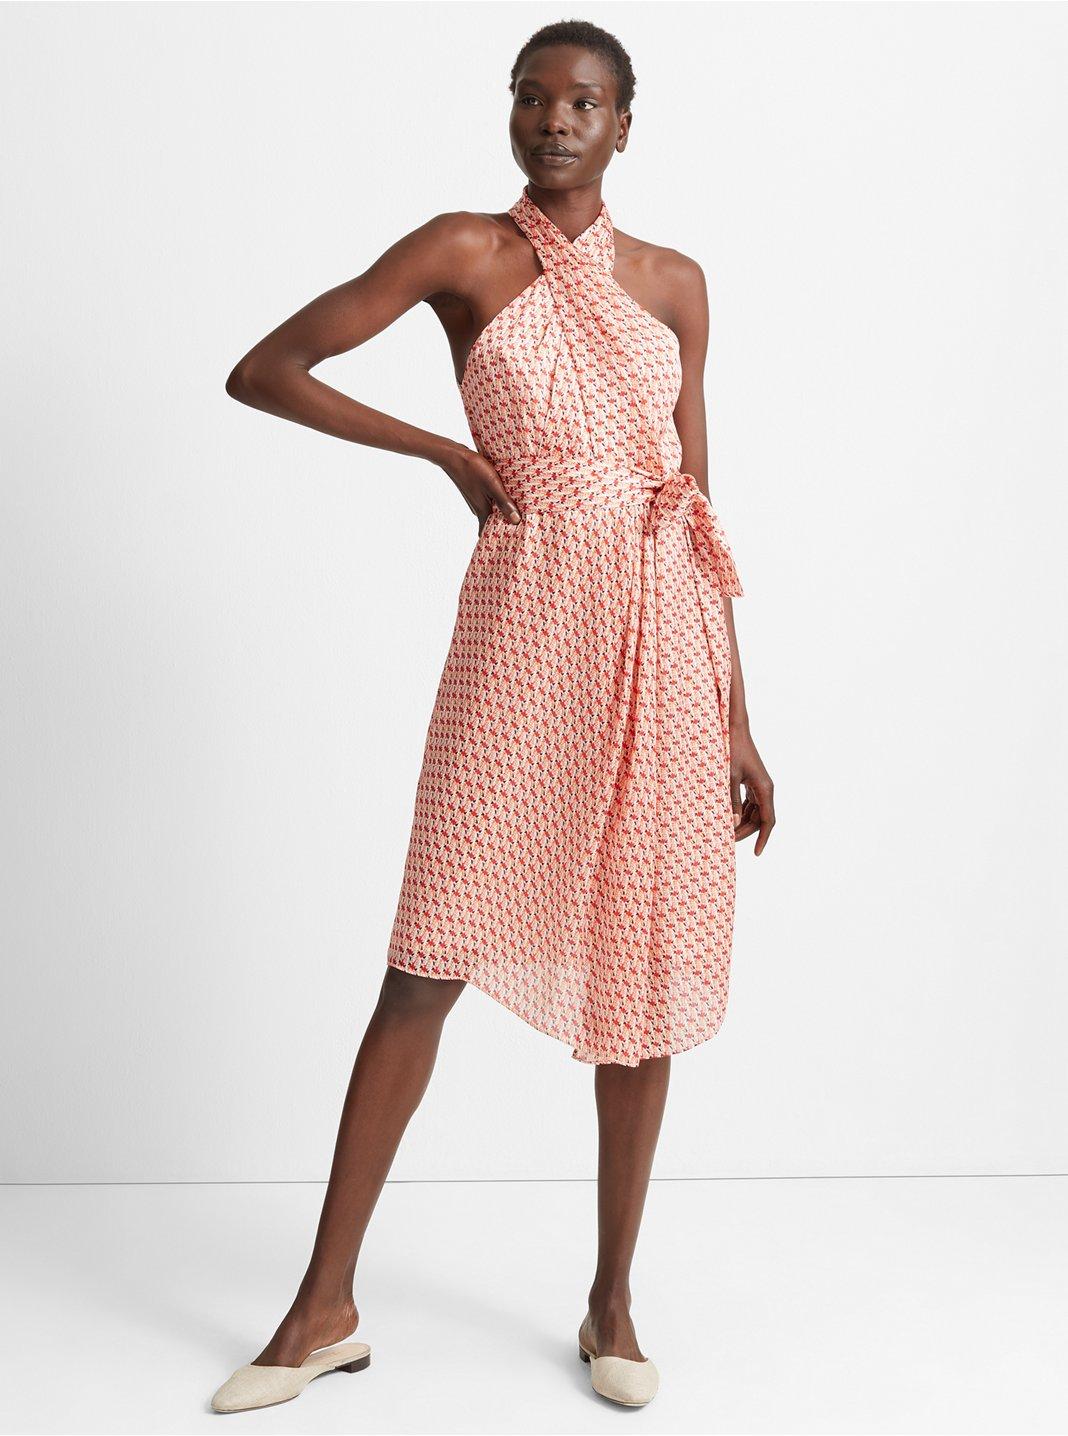 Bizbee Dress